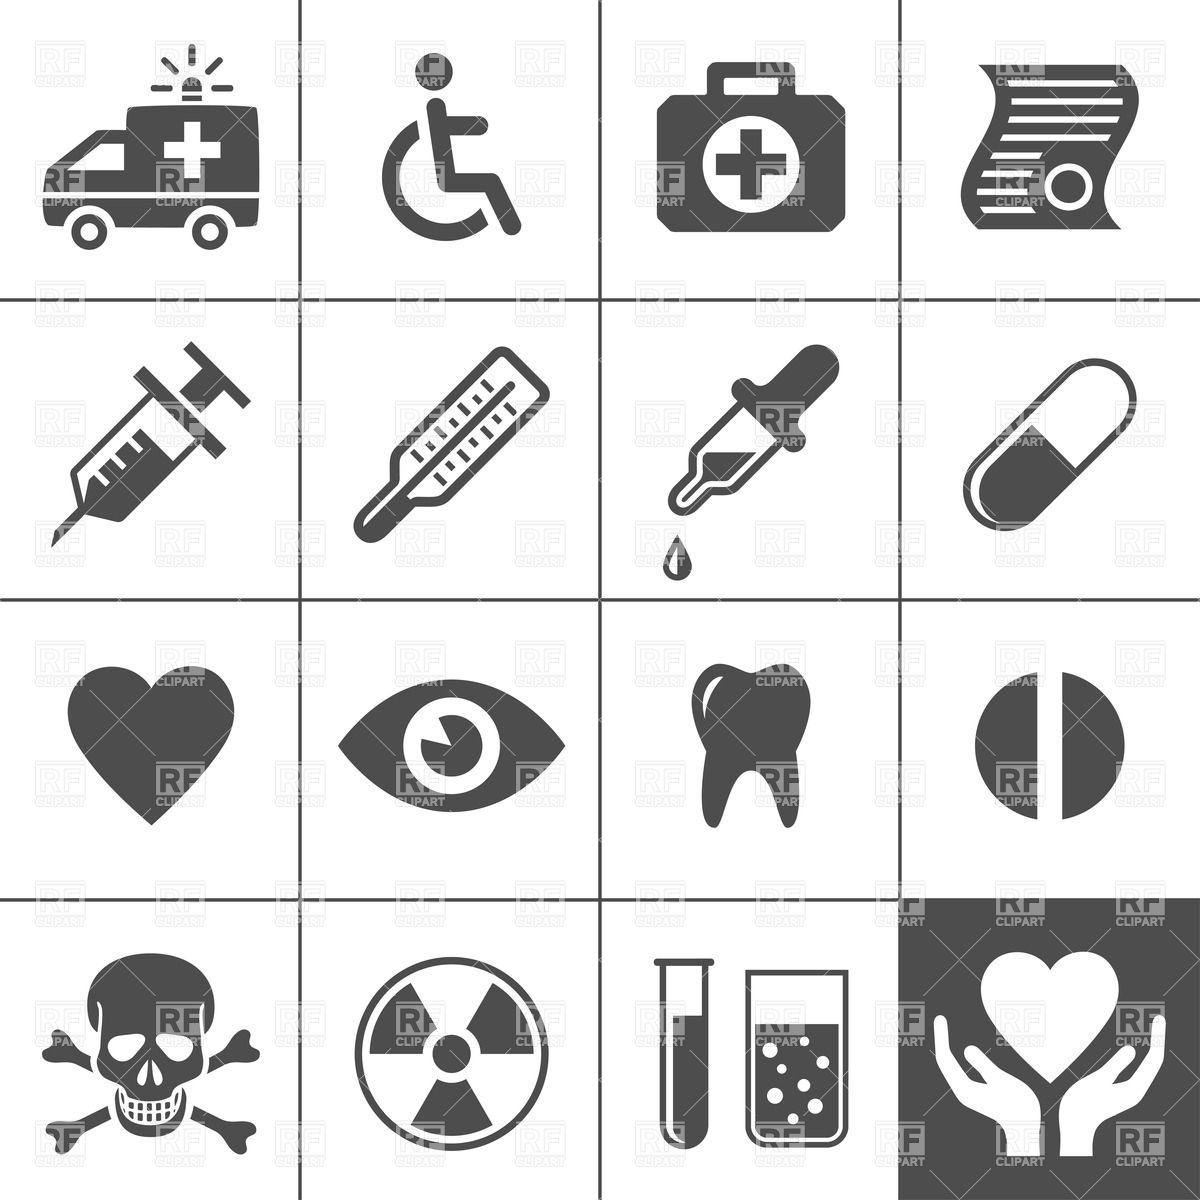 Medical Symbol Free Vector at GetDrawings.com.